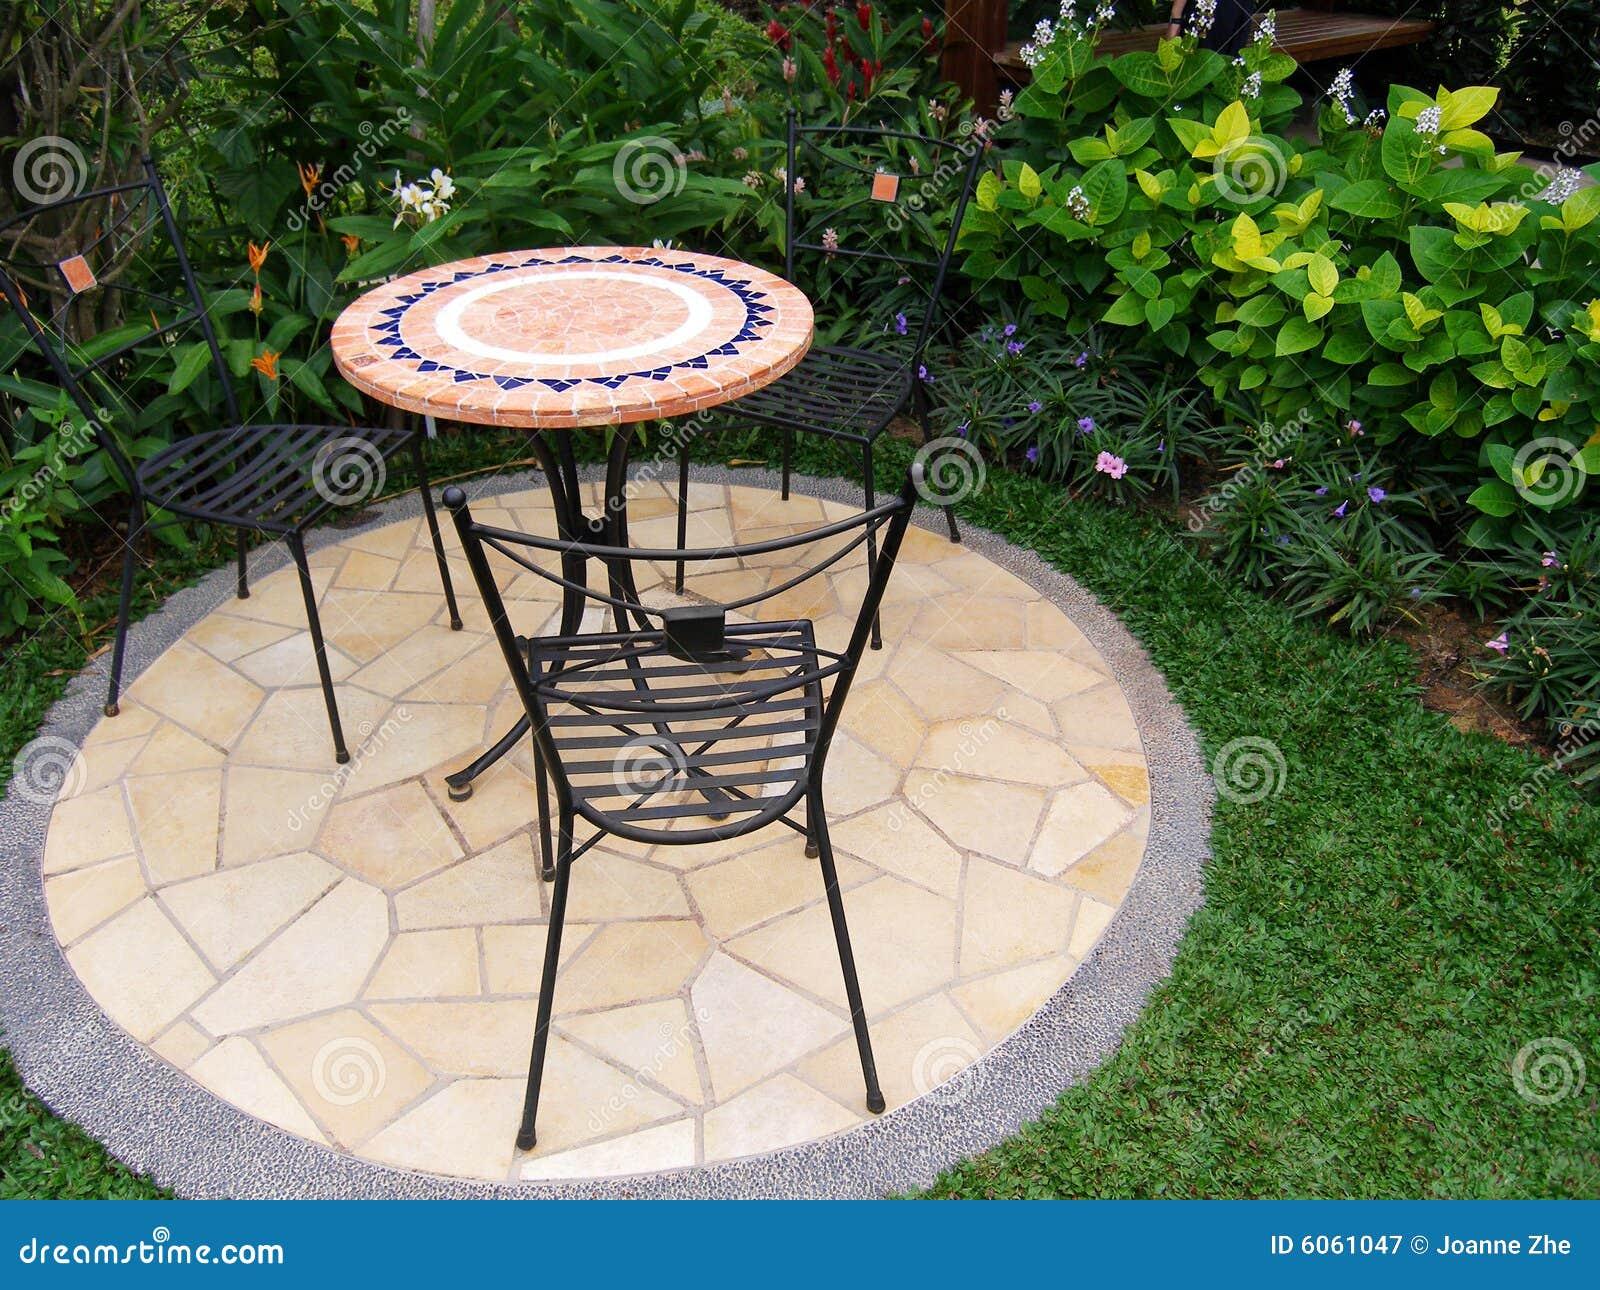 Muebles al aire libre del patio del jard n fotograf a de for Diseno de muebles de jardin al aire libre